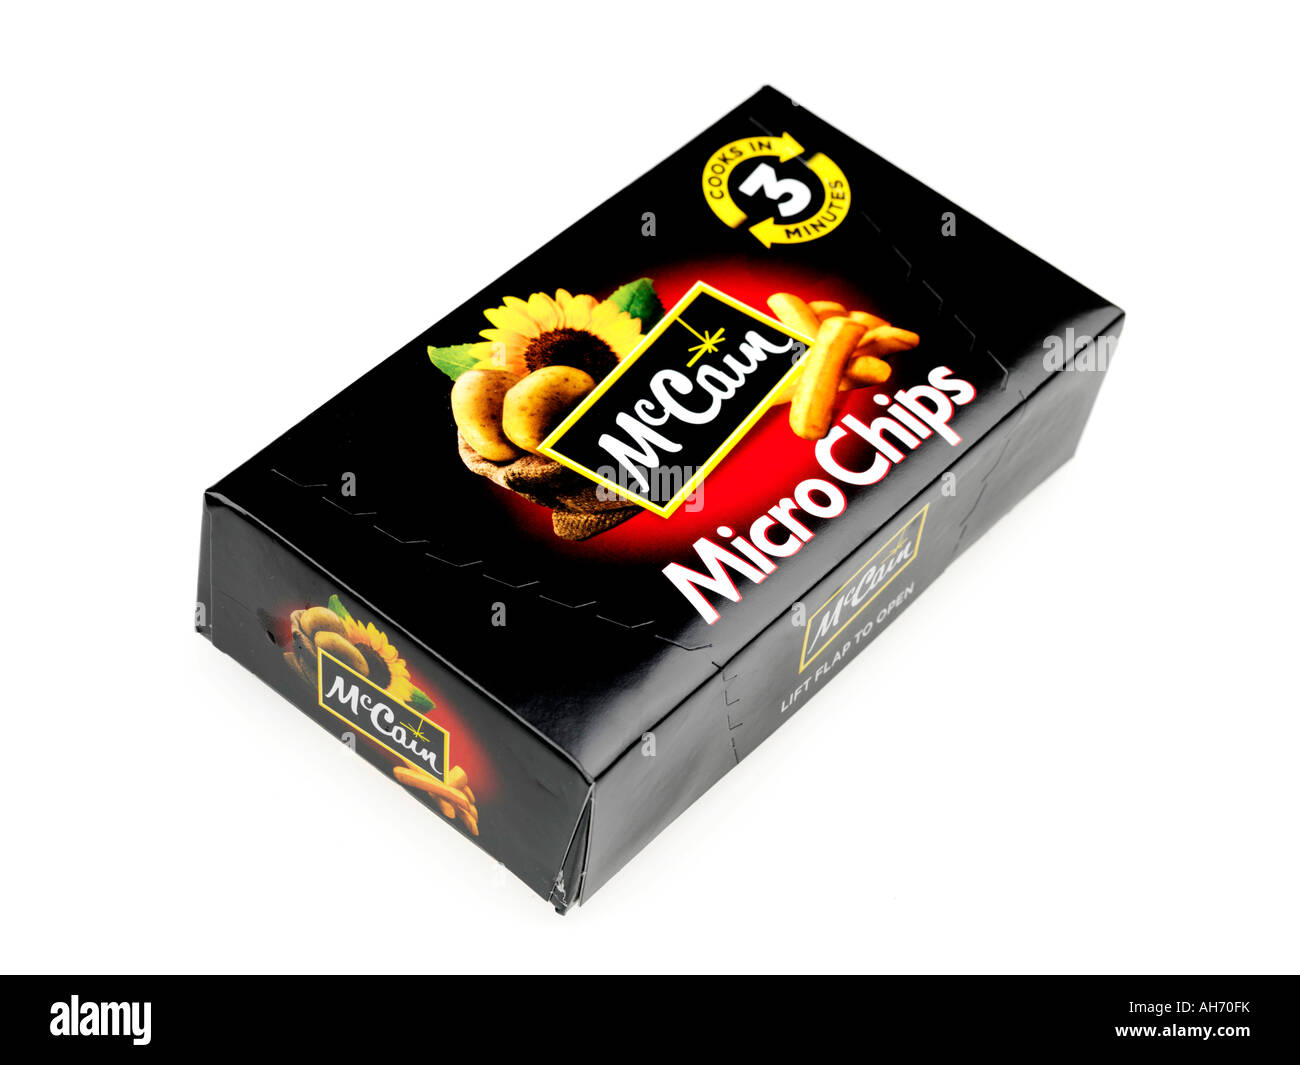 Micro Chips Stock Photo: 14378742 - Alamy